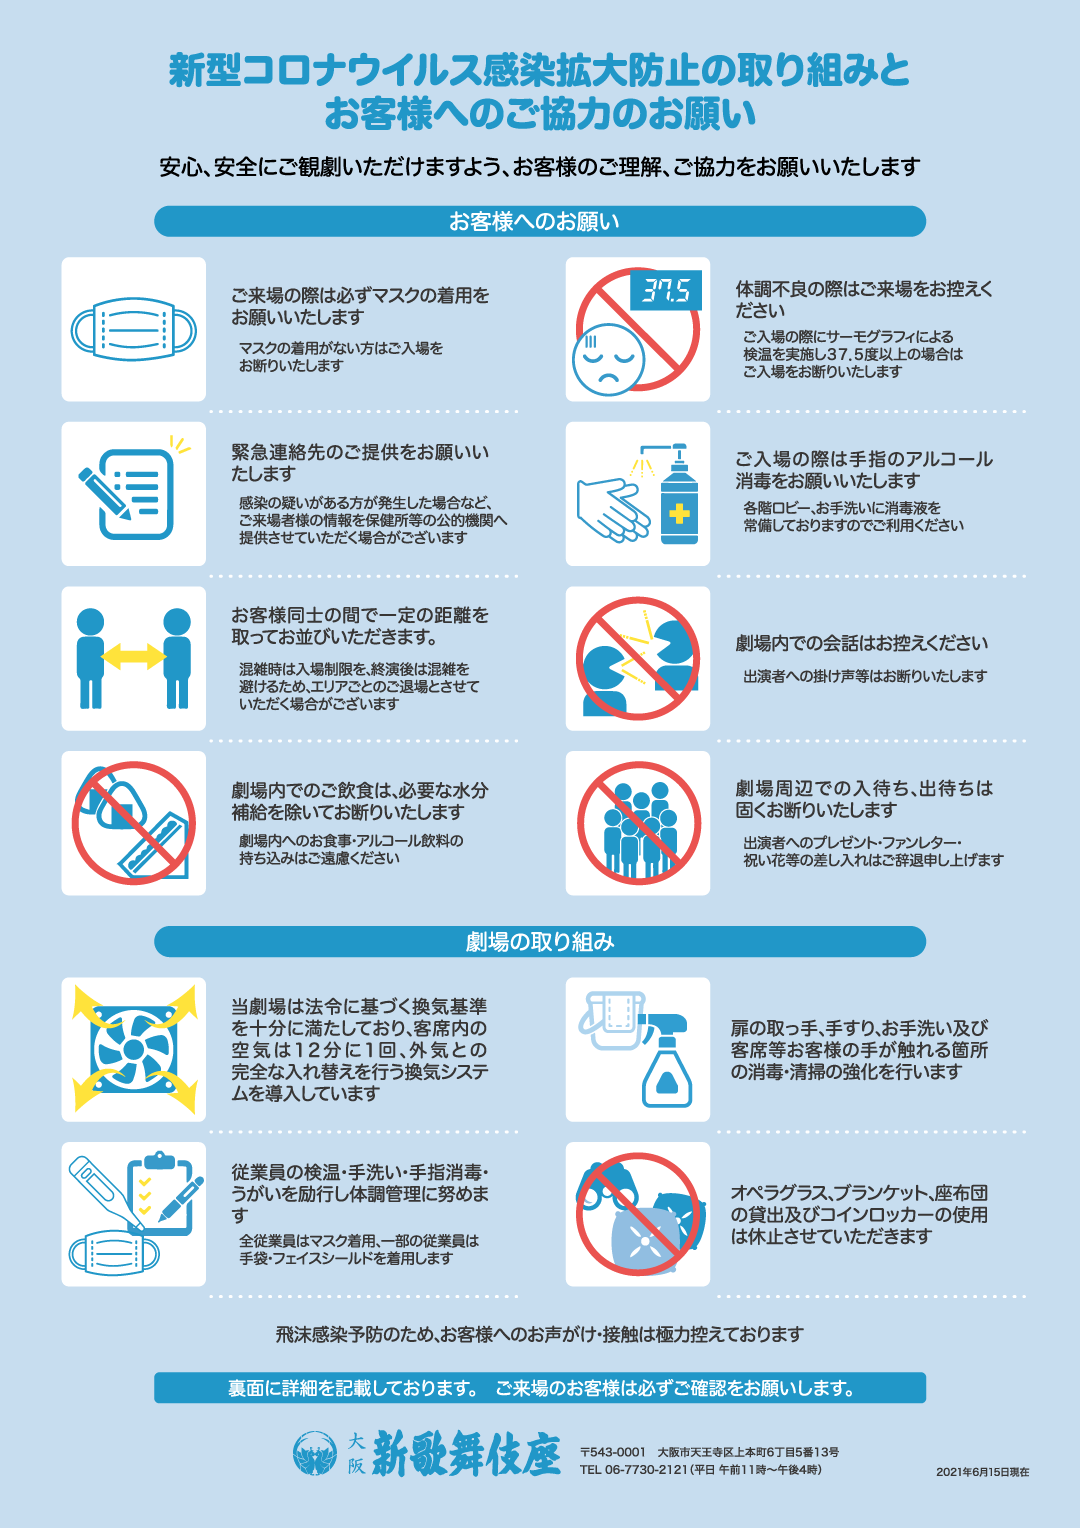 https://www.shinkabukiza.co.jp/info/images/kansentaisaku202106.png